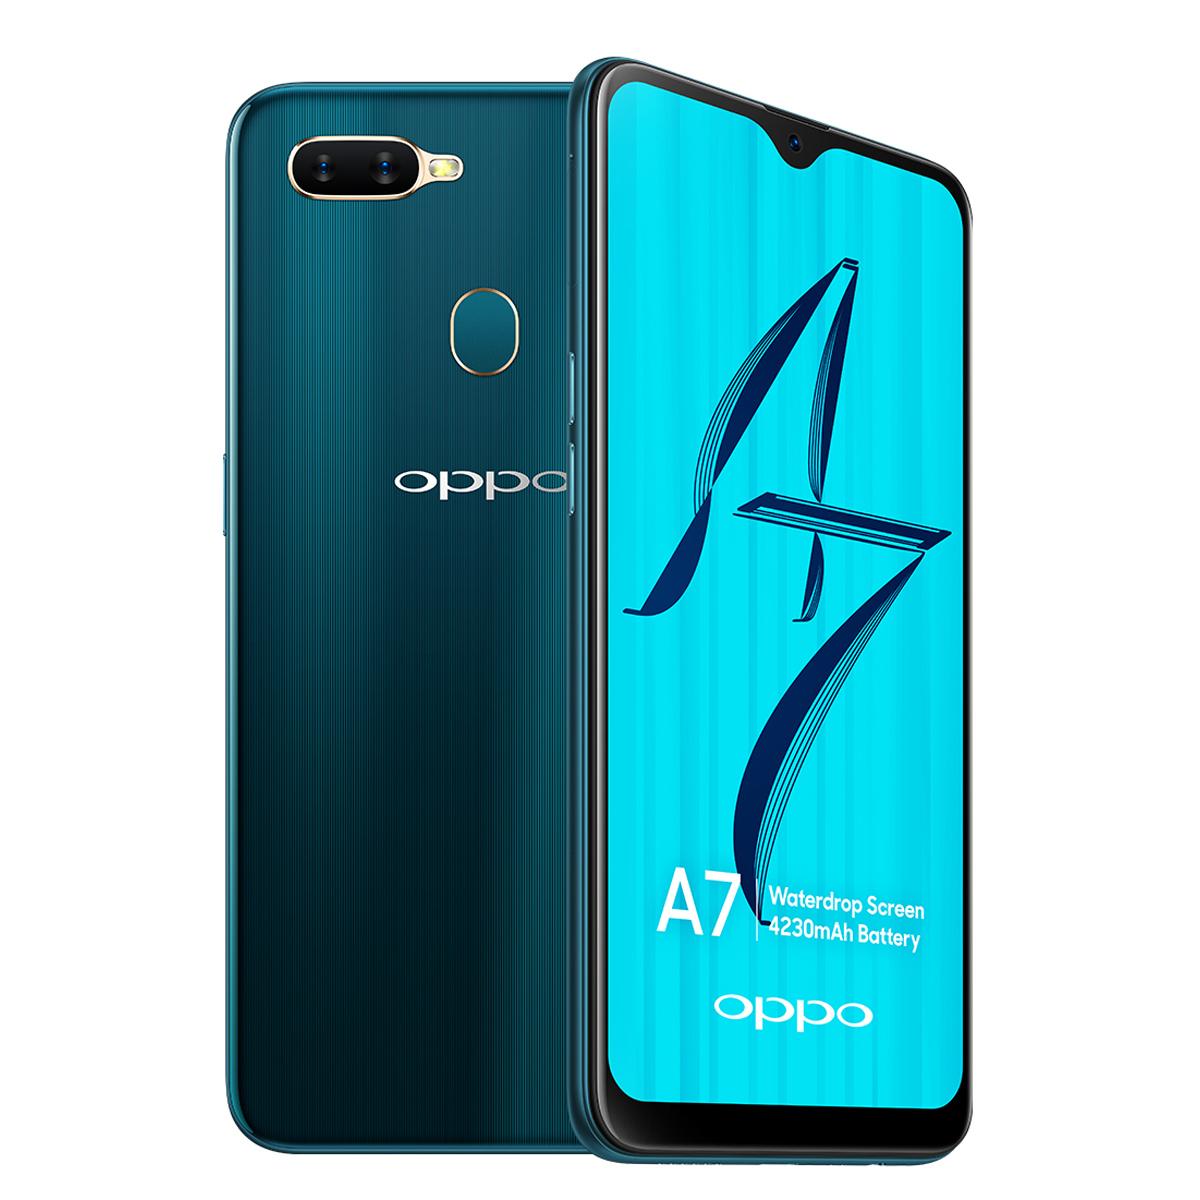 Luxury design smartphone Oppo A7